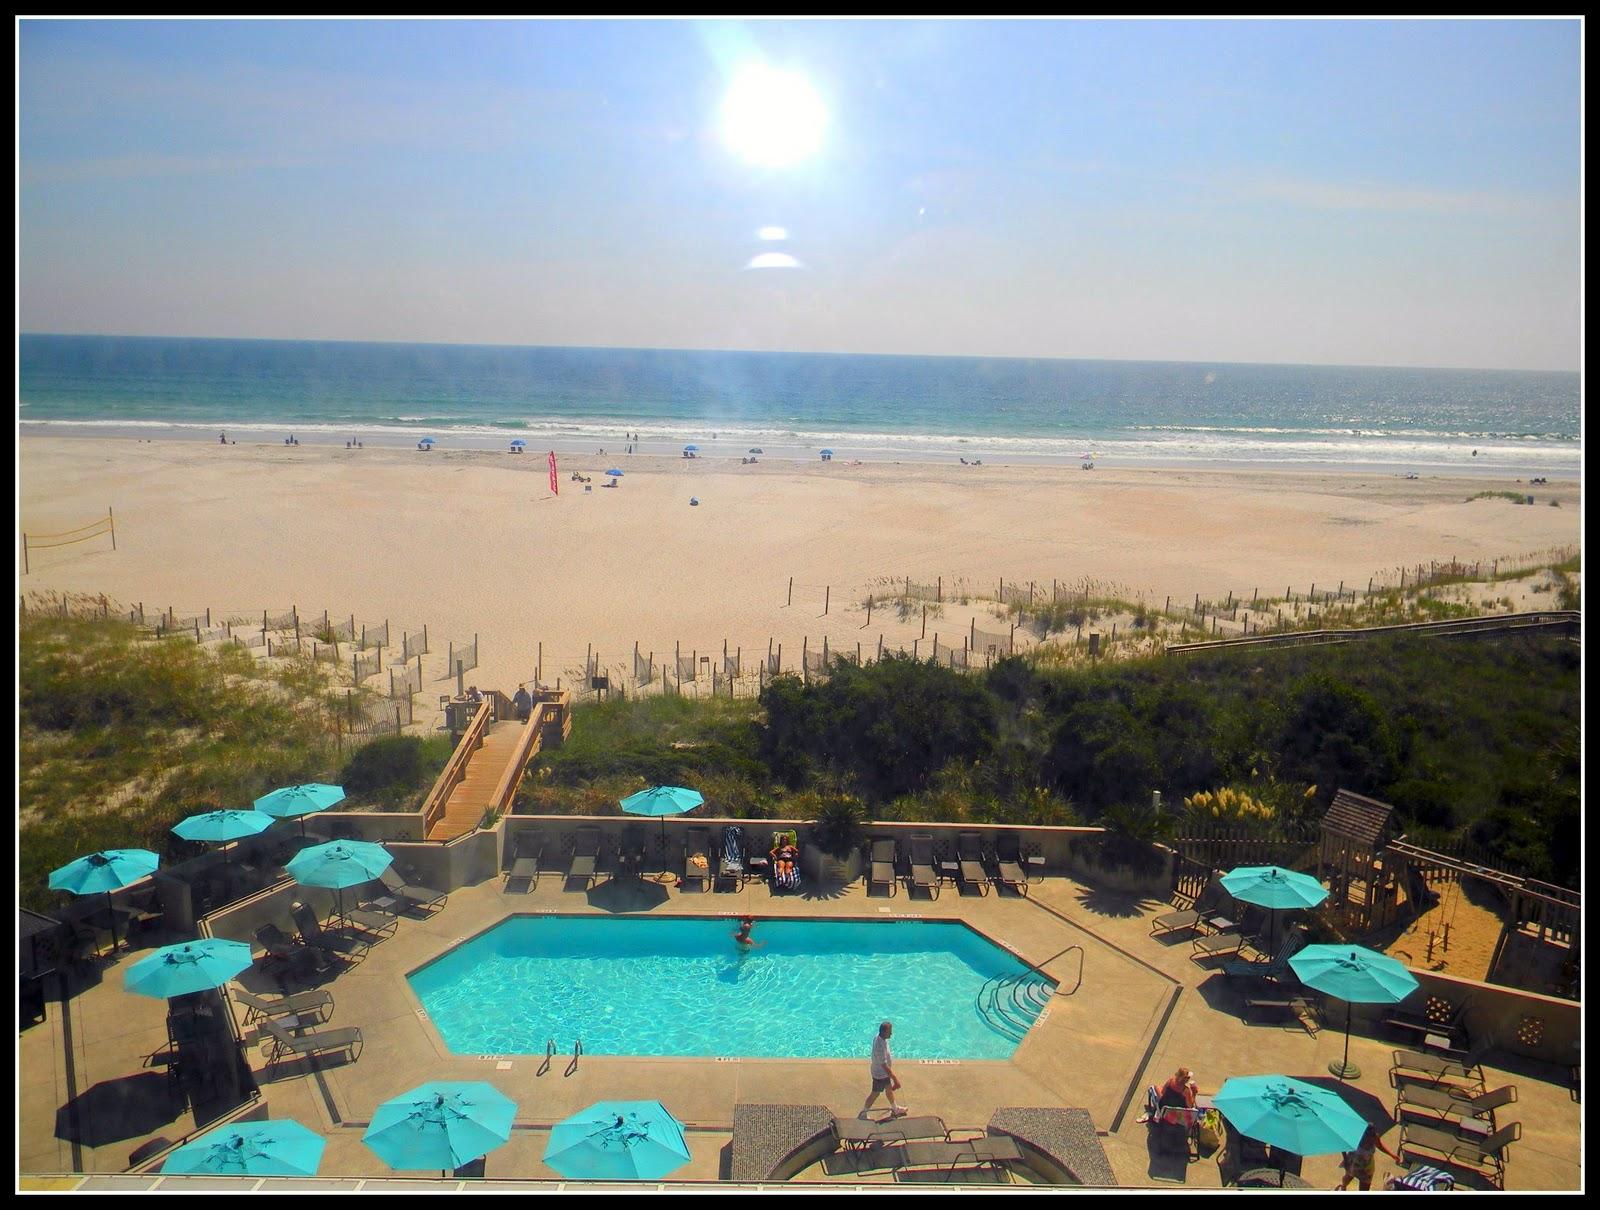 Shell Island Resort Outdoor Swimming Pool